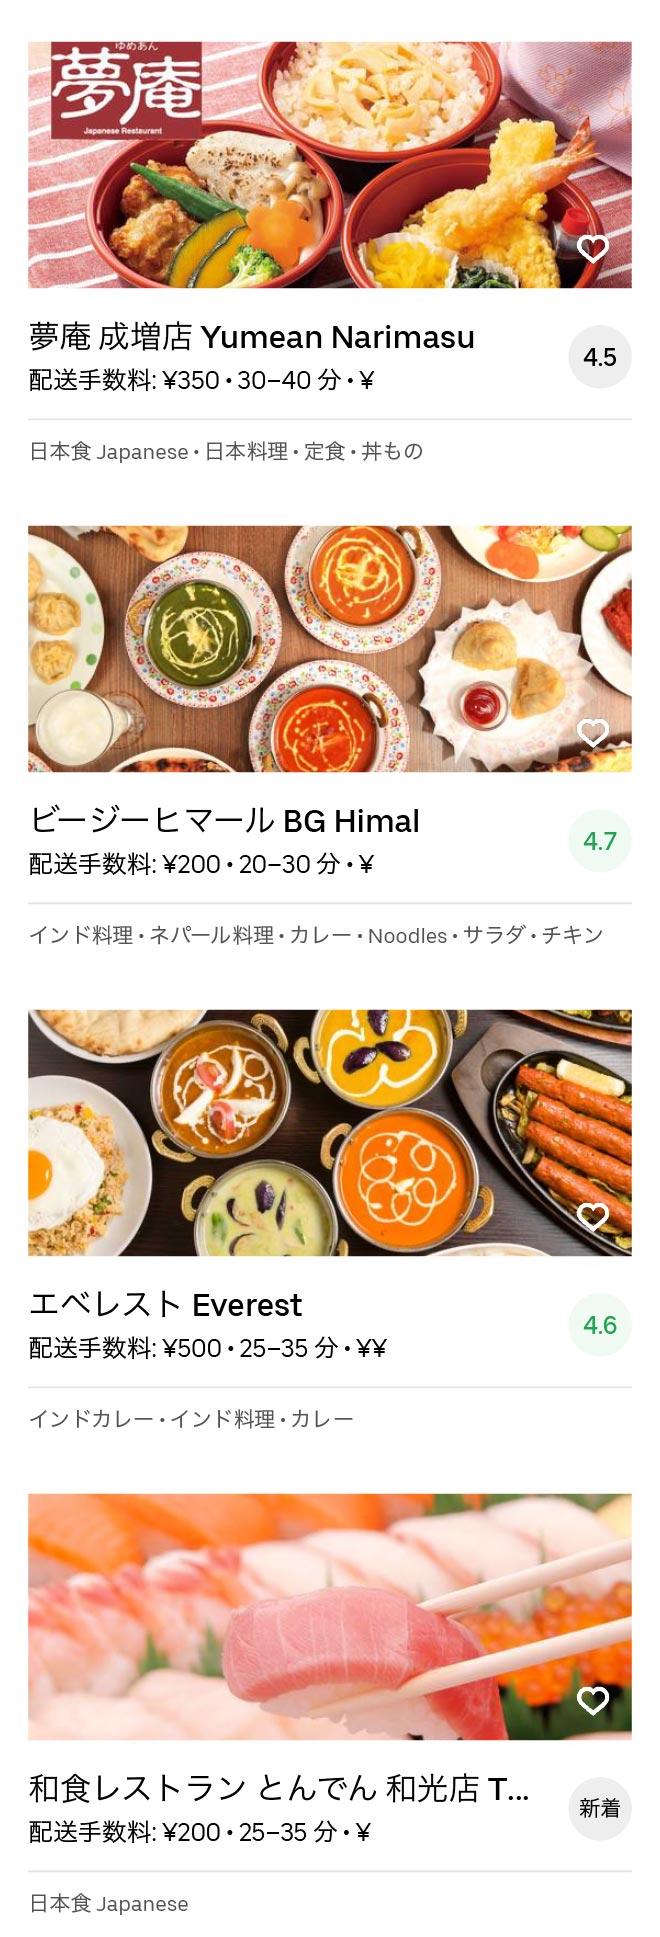 Saitama wako menu 2004 12